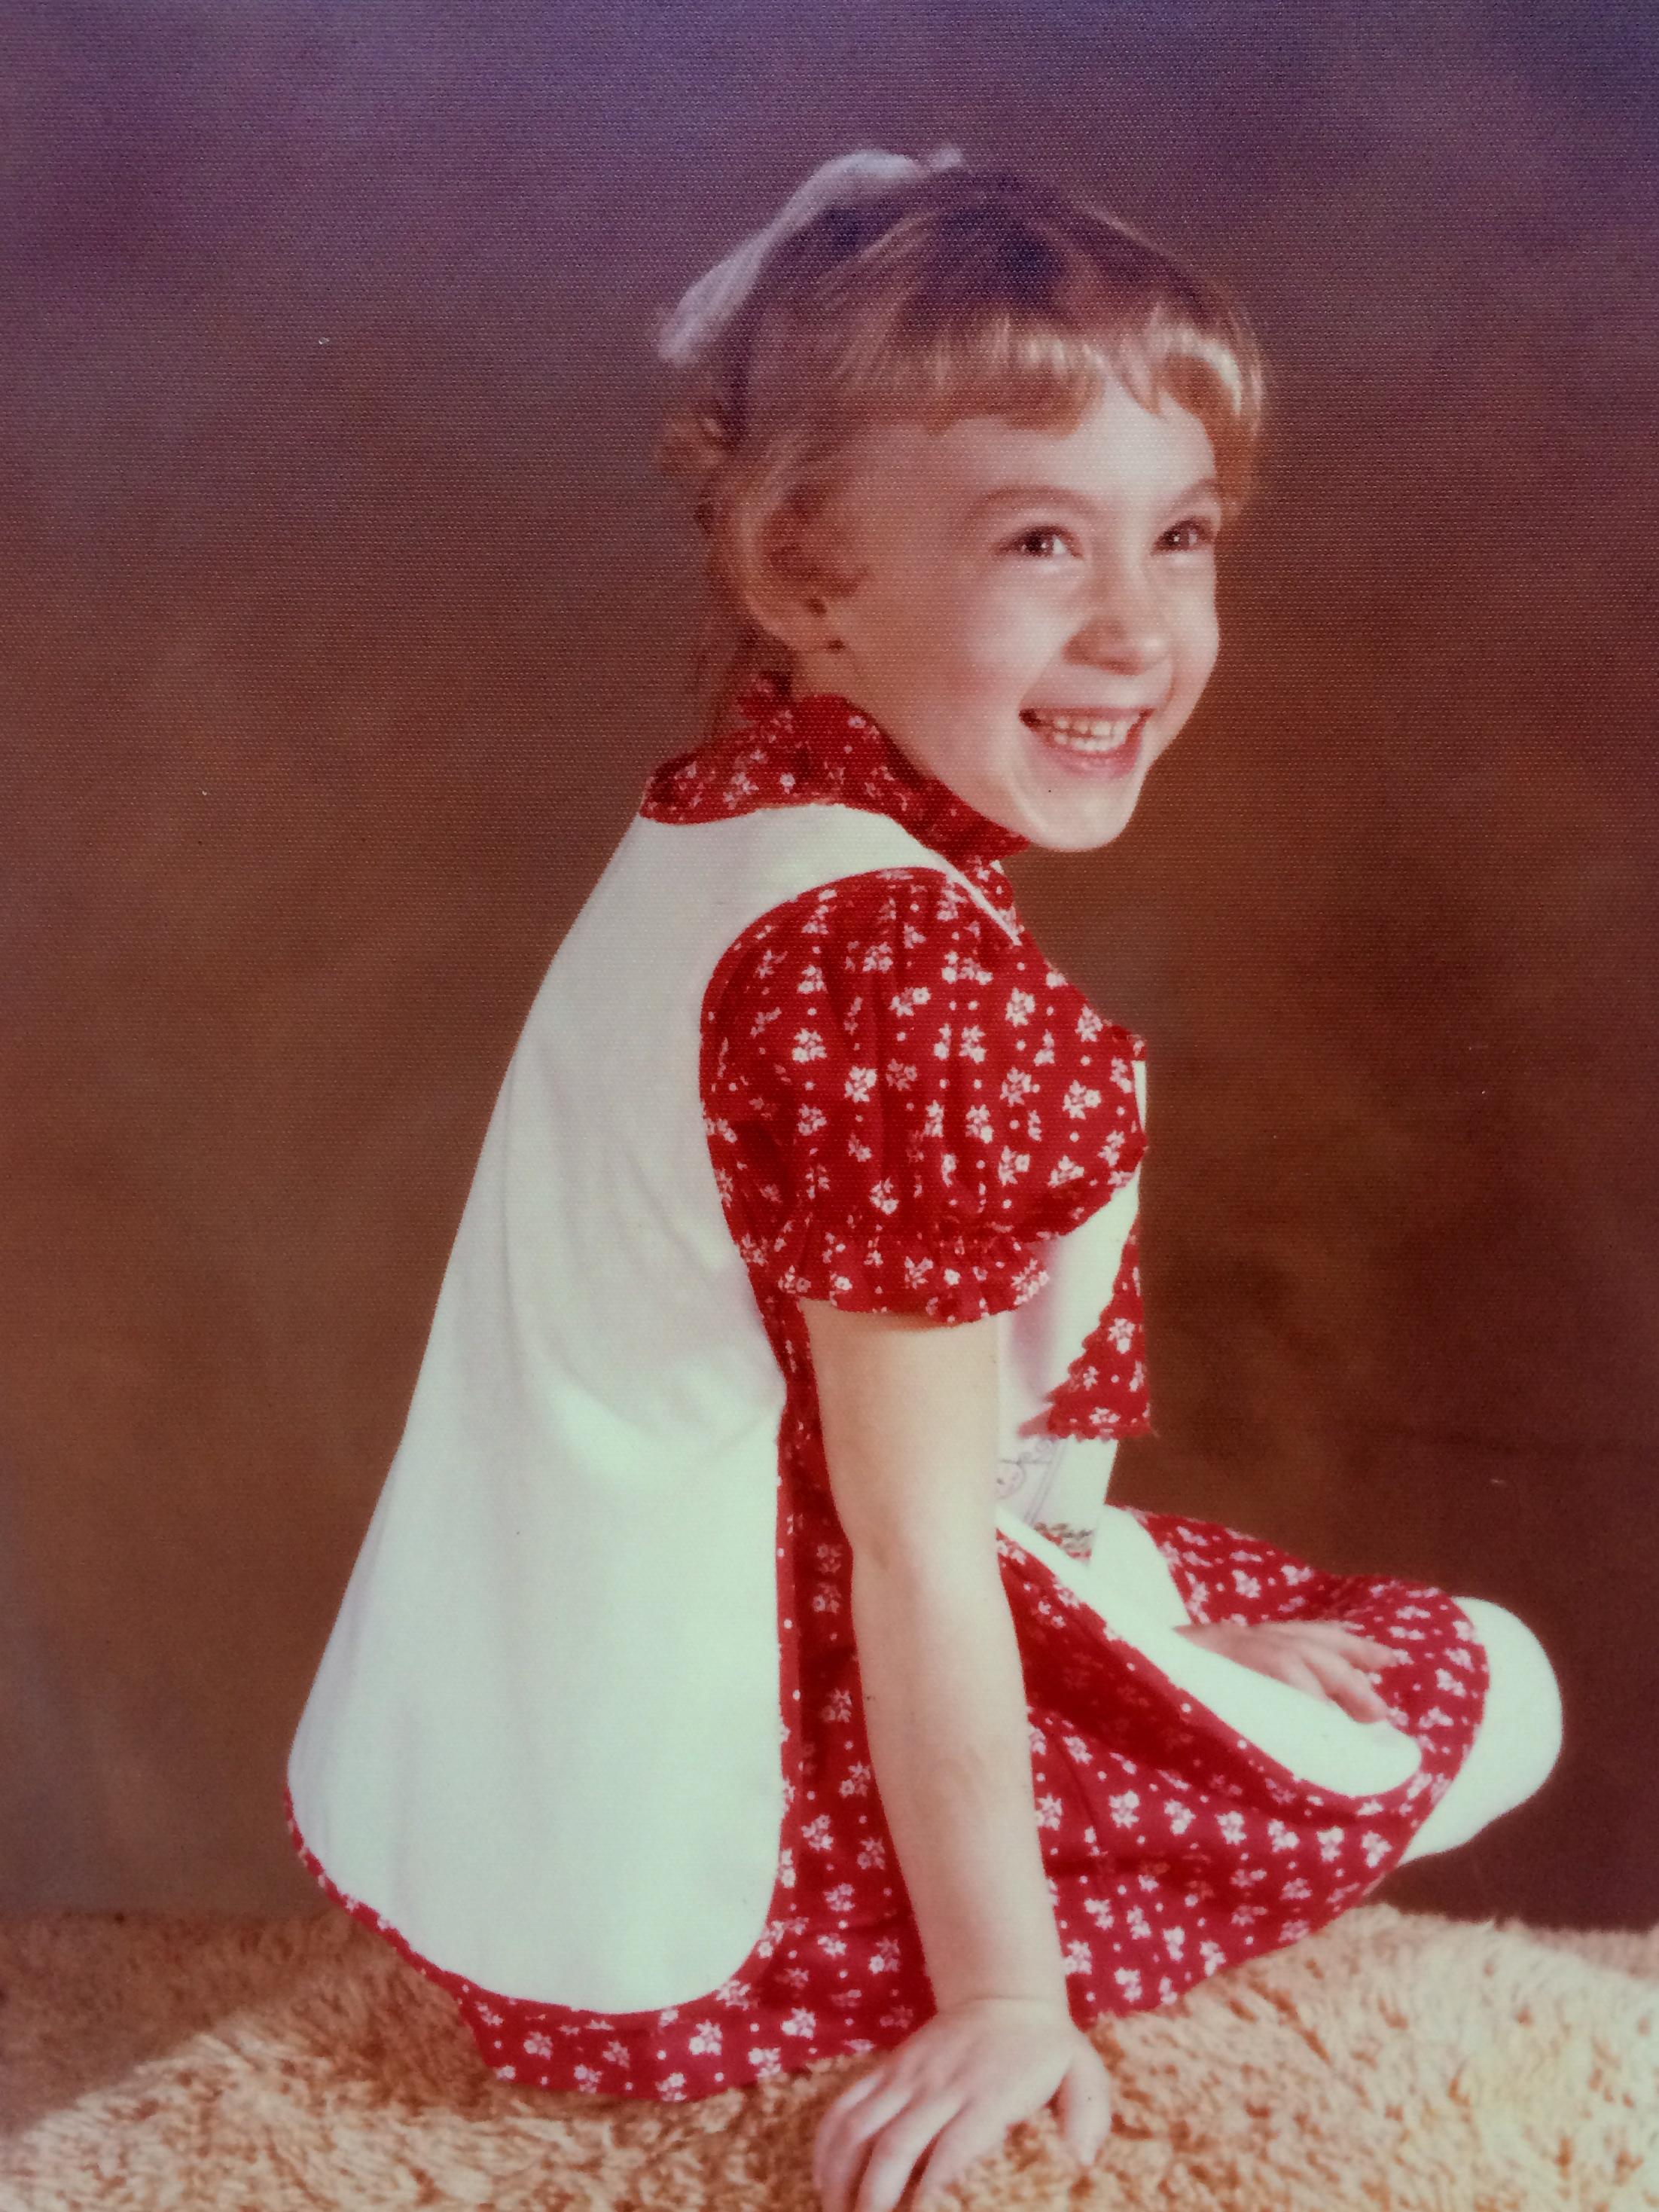 Jen Gresham - Yes, that's actually me in preschool.